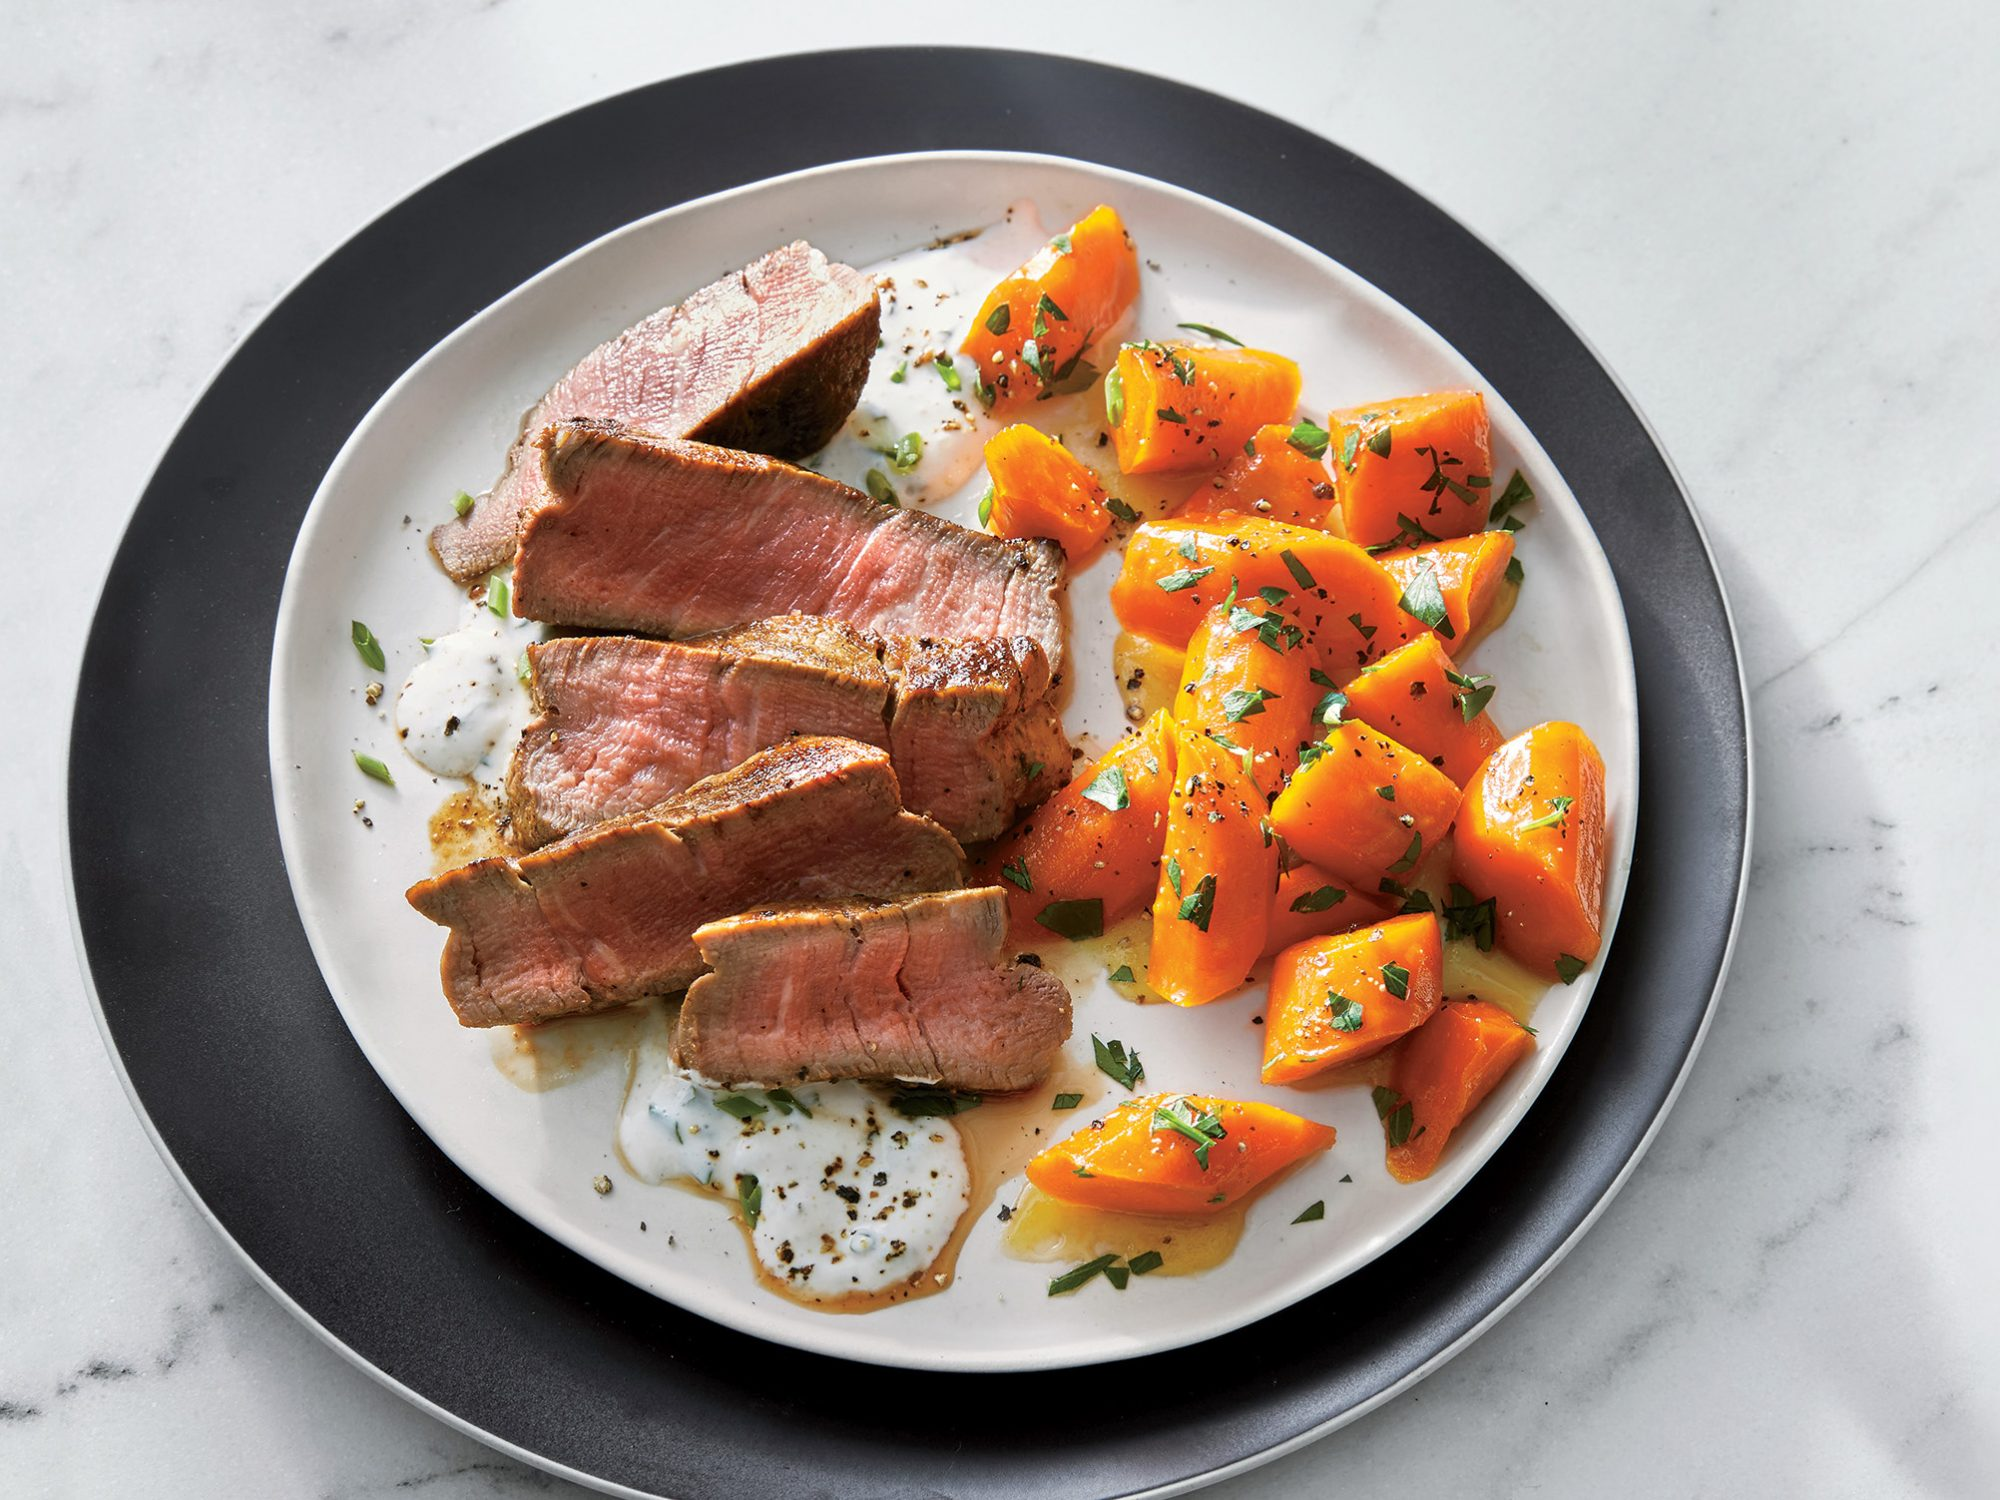 Beef Tenderloin with Horseradish Cream and Glazed Carrots